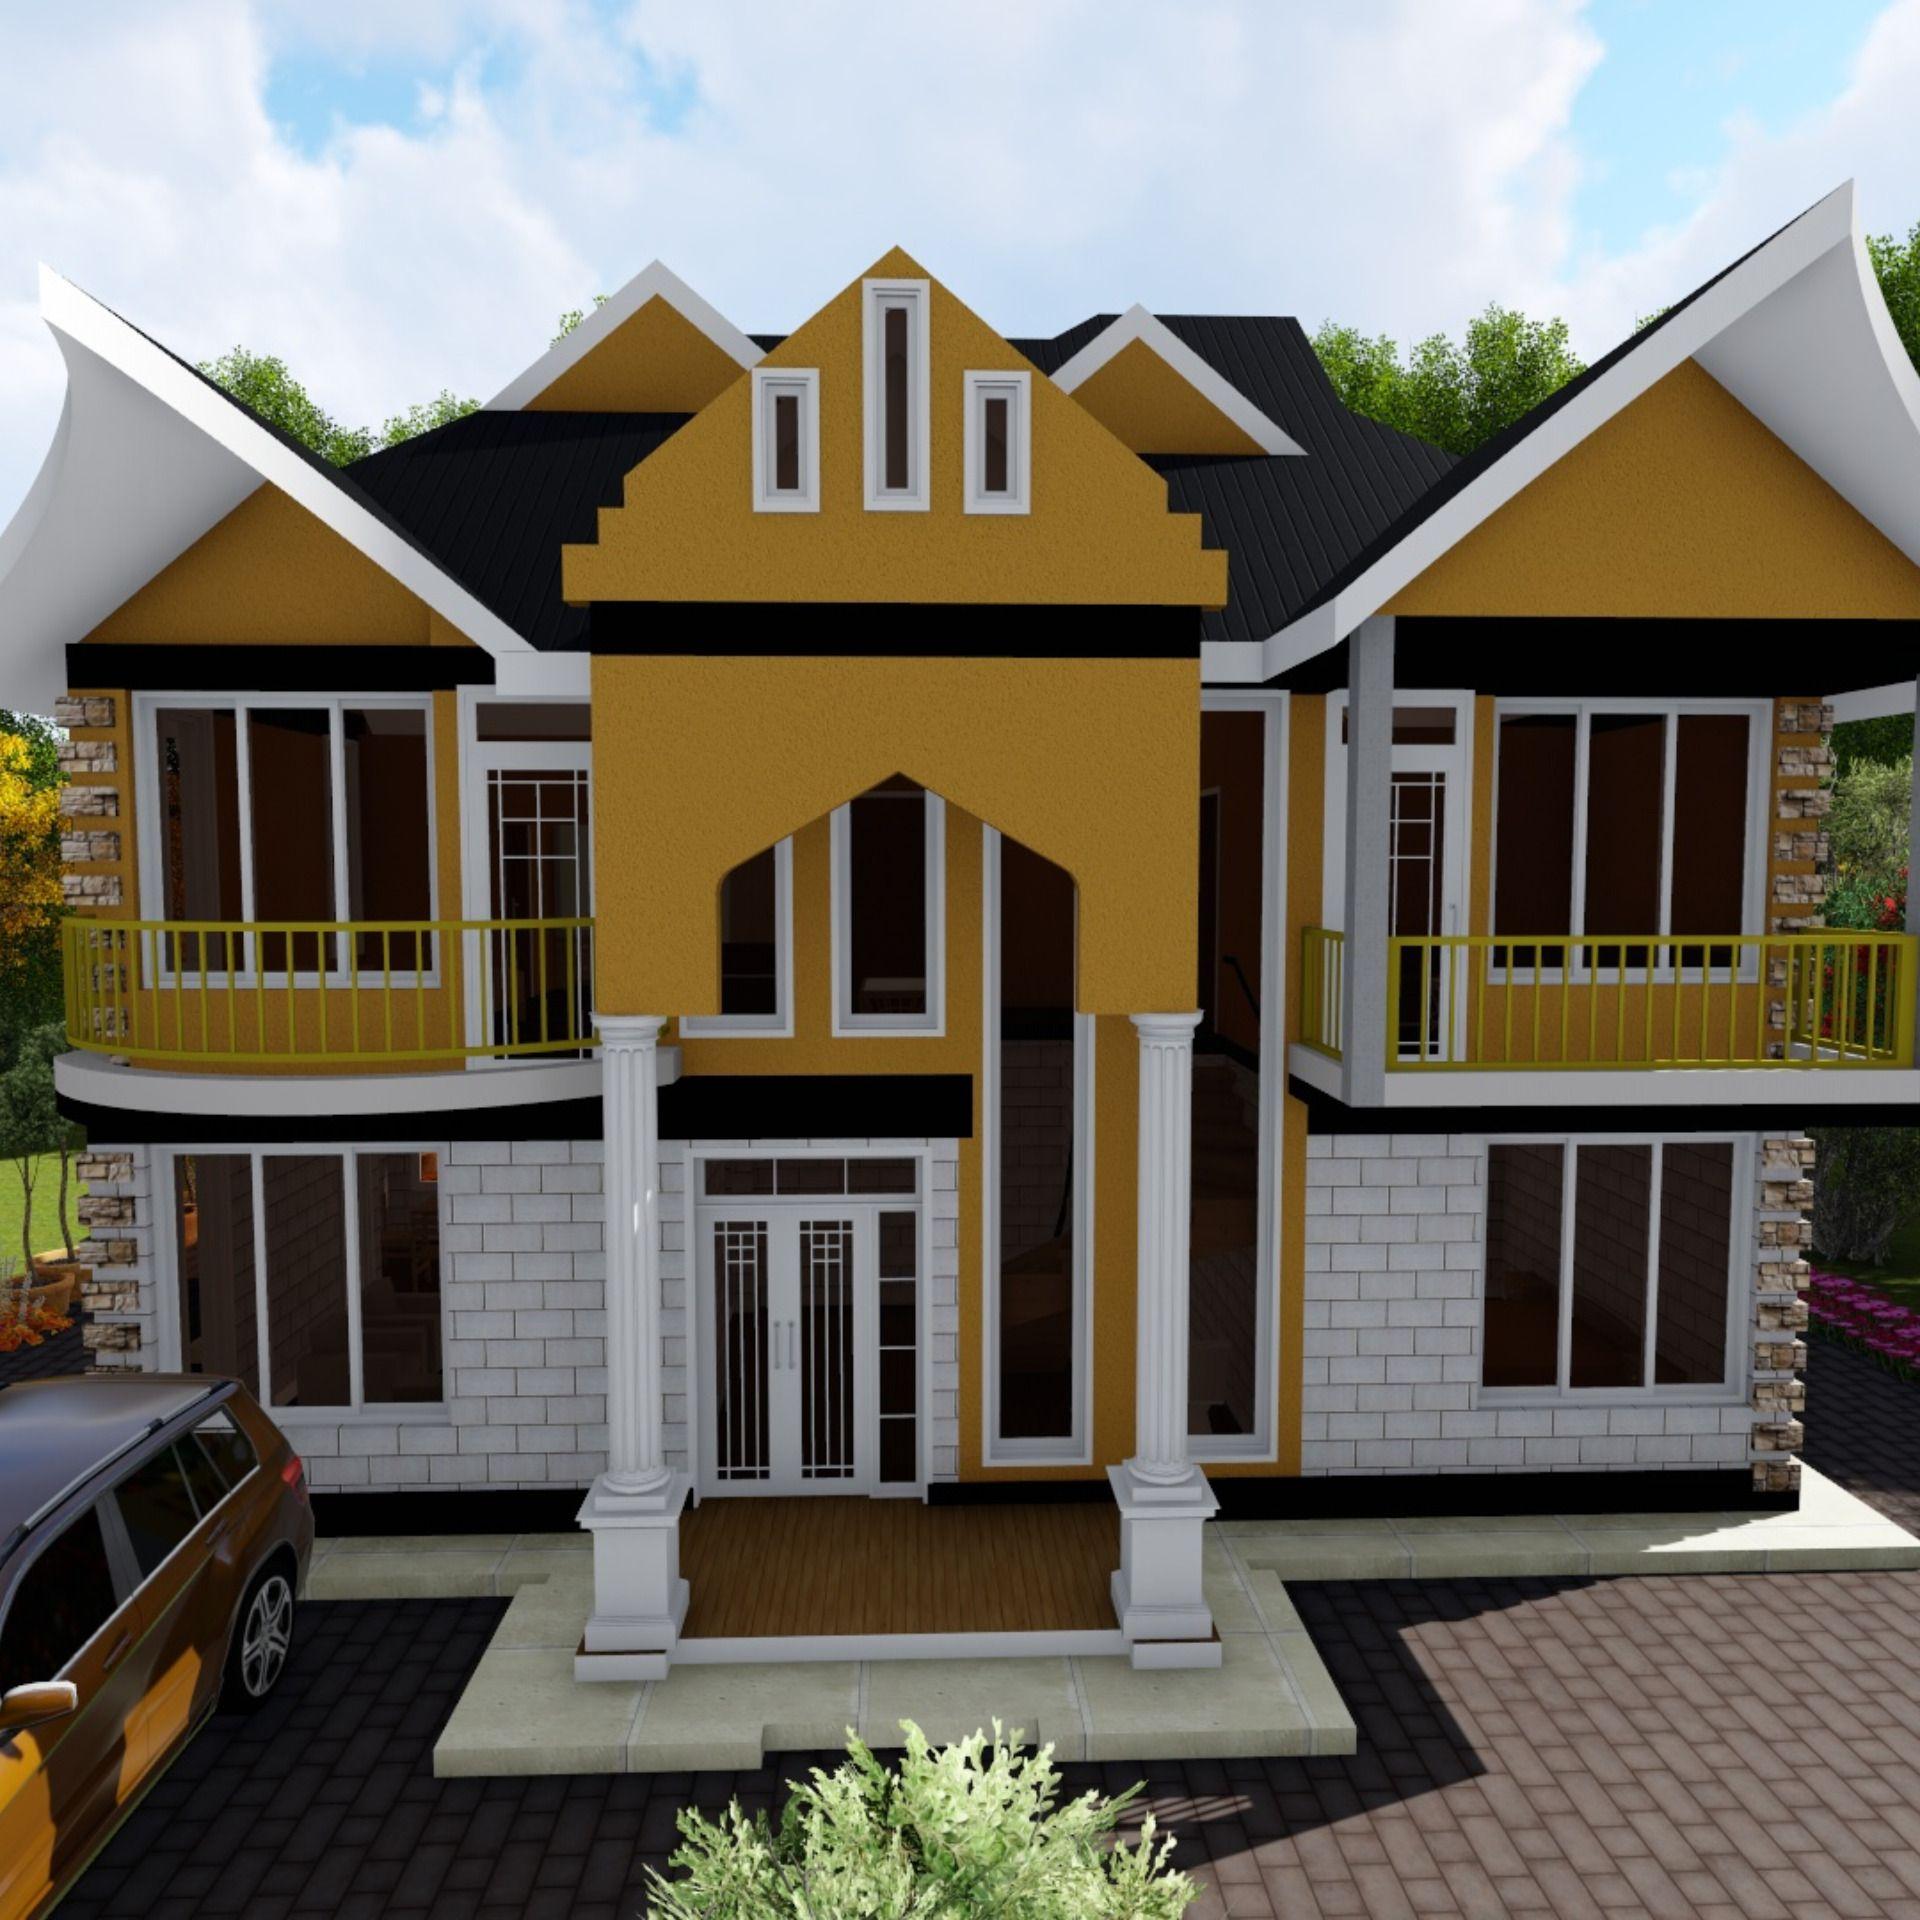 4 Bedroom Roofed Home House Designs In Kenya 4 Bedroom House Designs House Design